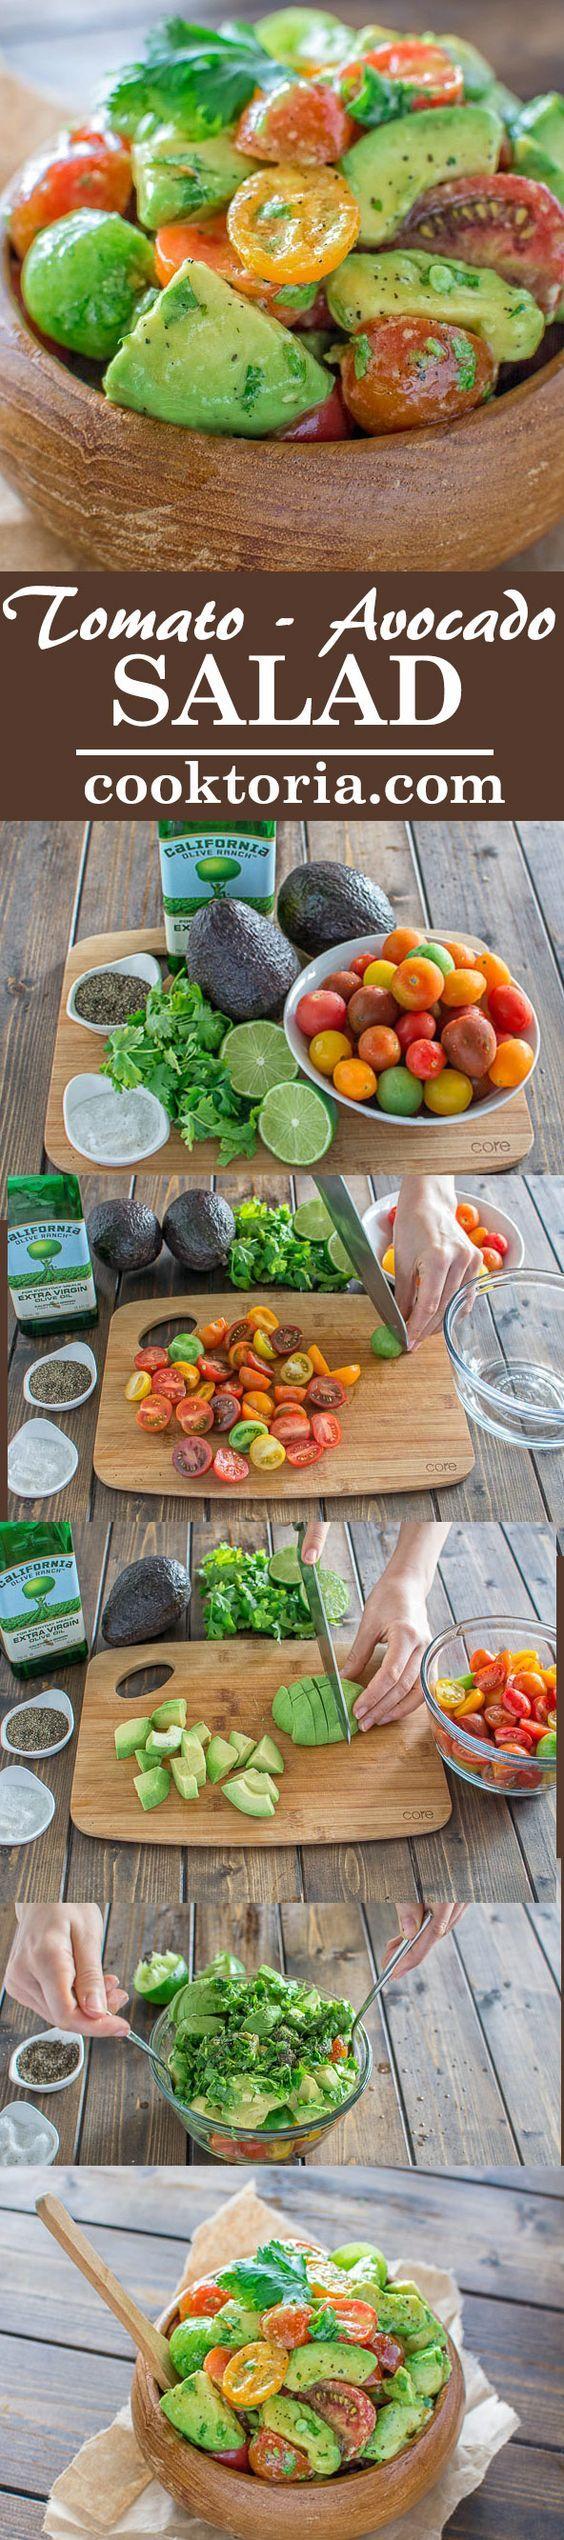 Tomato Avocado Salad | Recipe